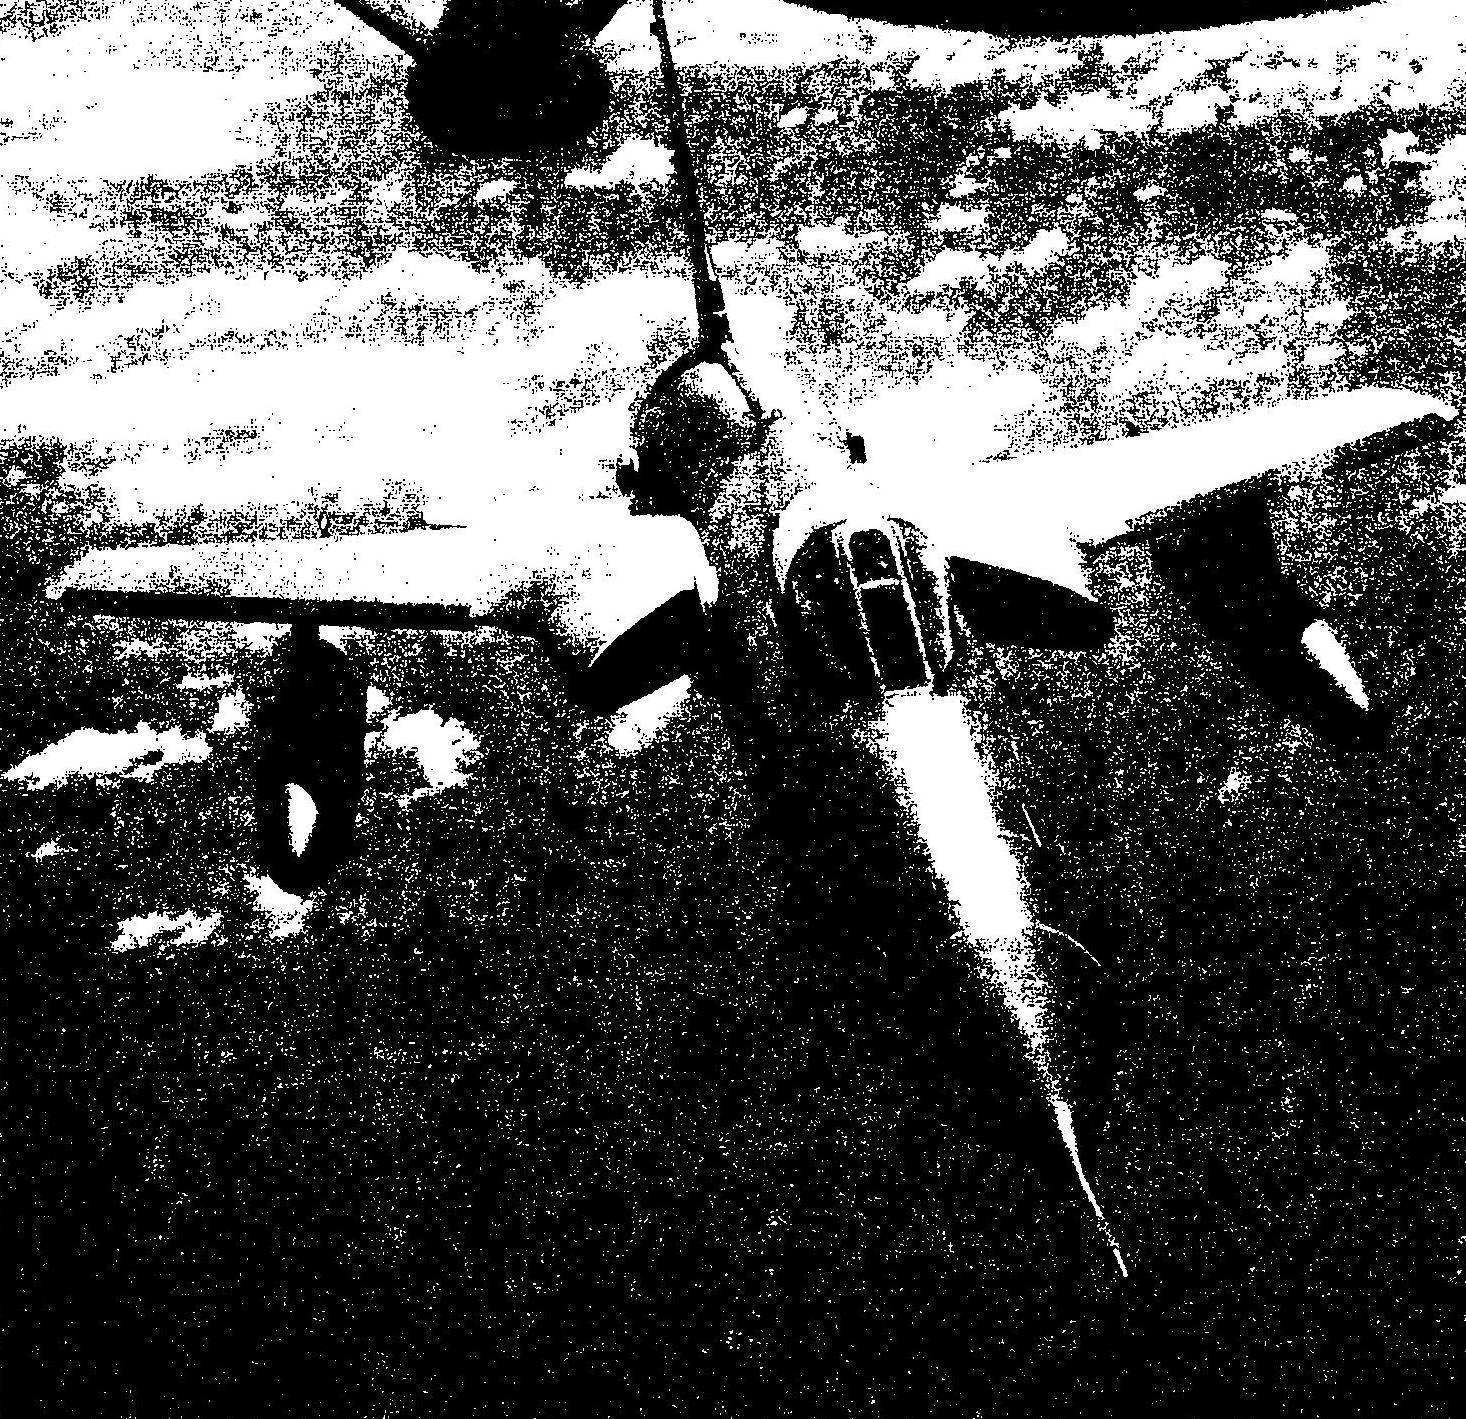 F-105G preparing for in-flight refueling